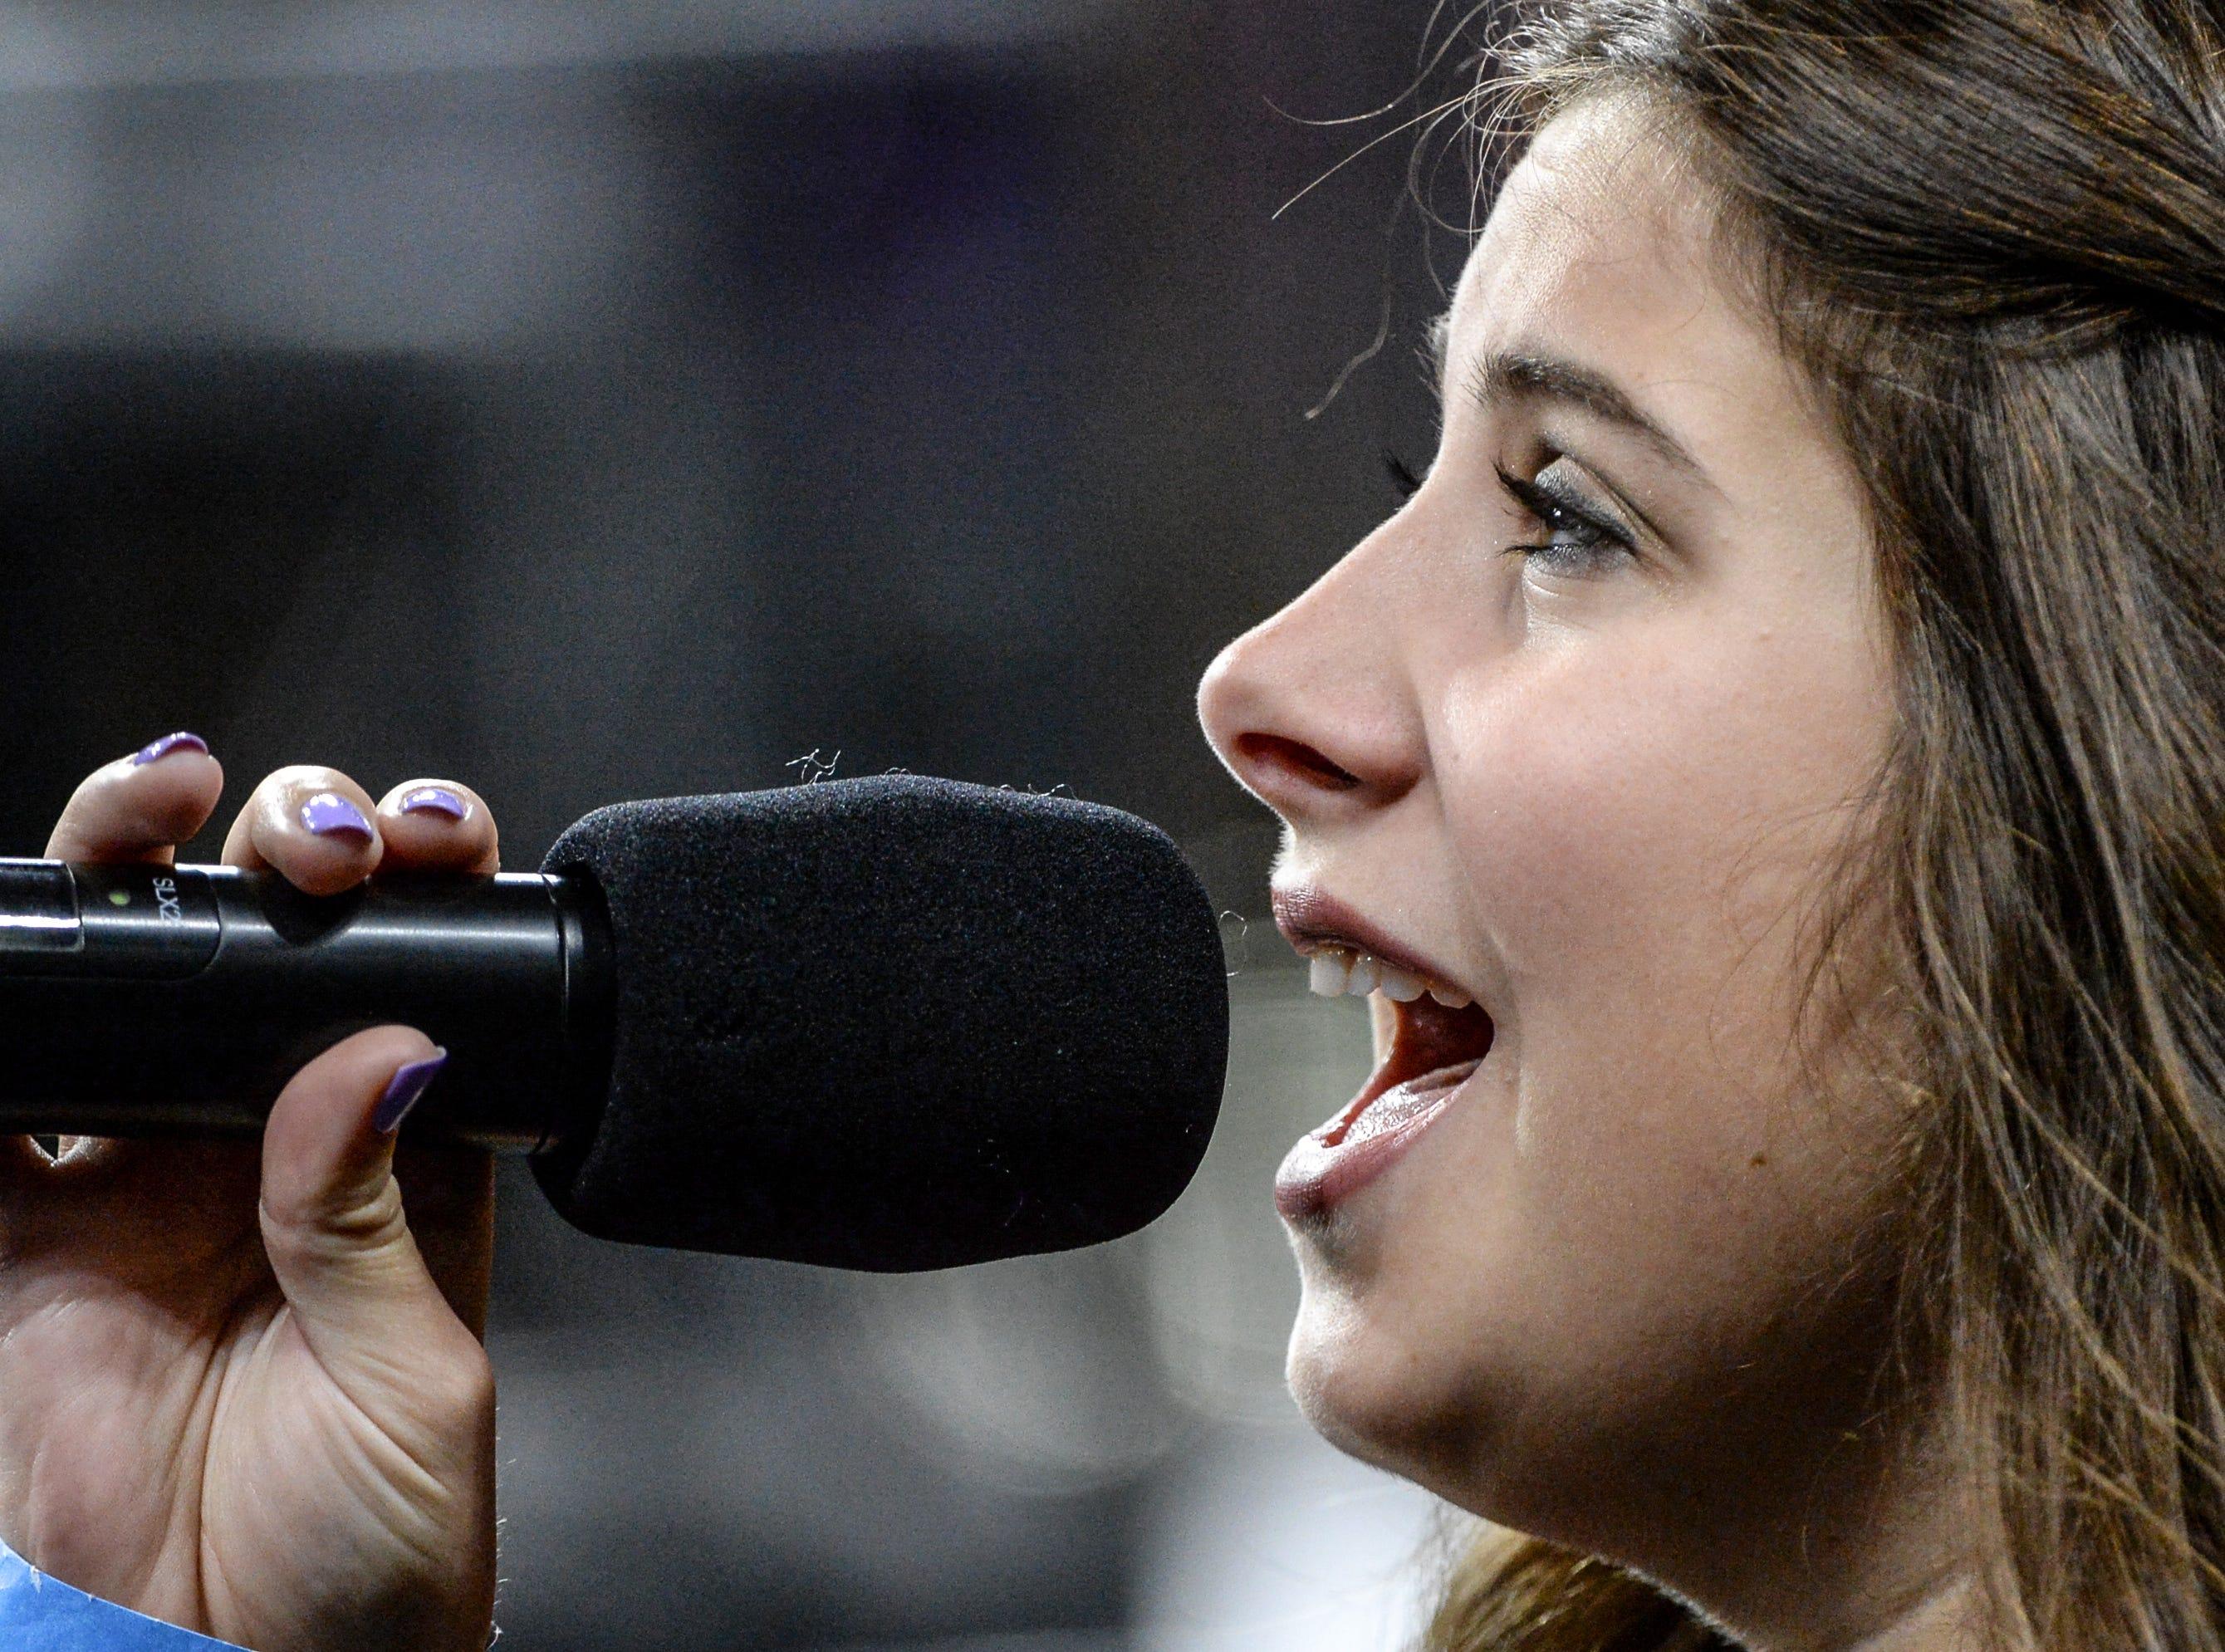 Graduate Emma Baker sings the National Anthem during Clemson University commencement ceremonies in Littlejohn Coliseum in Clemson Friday, May 10, 2019.